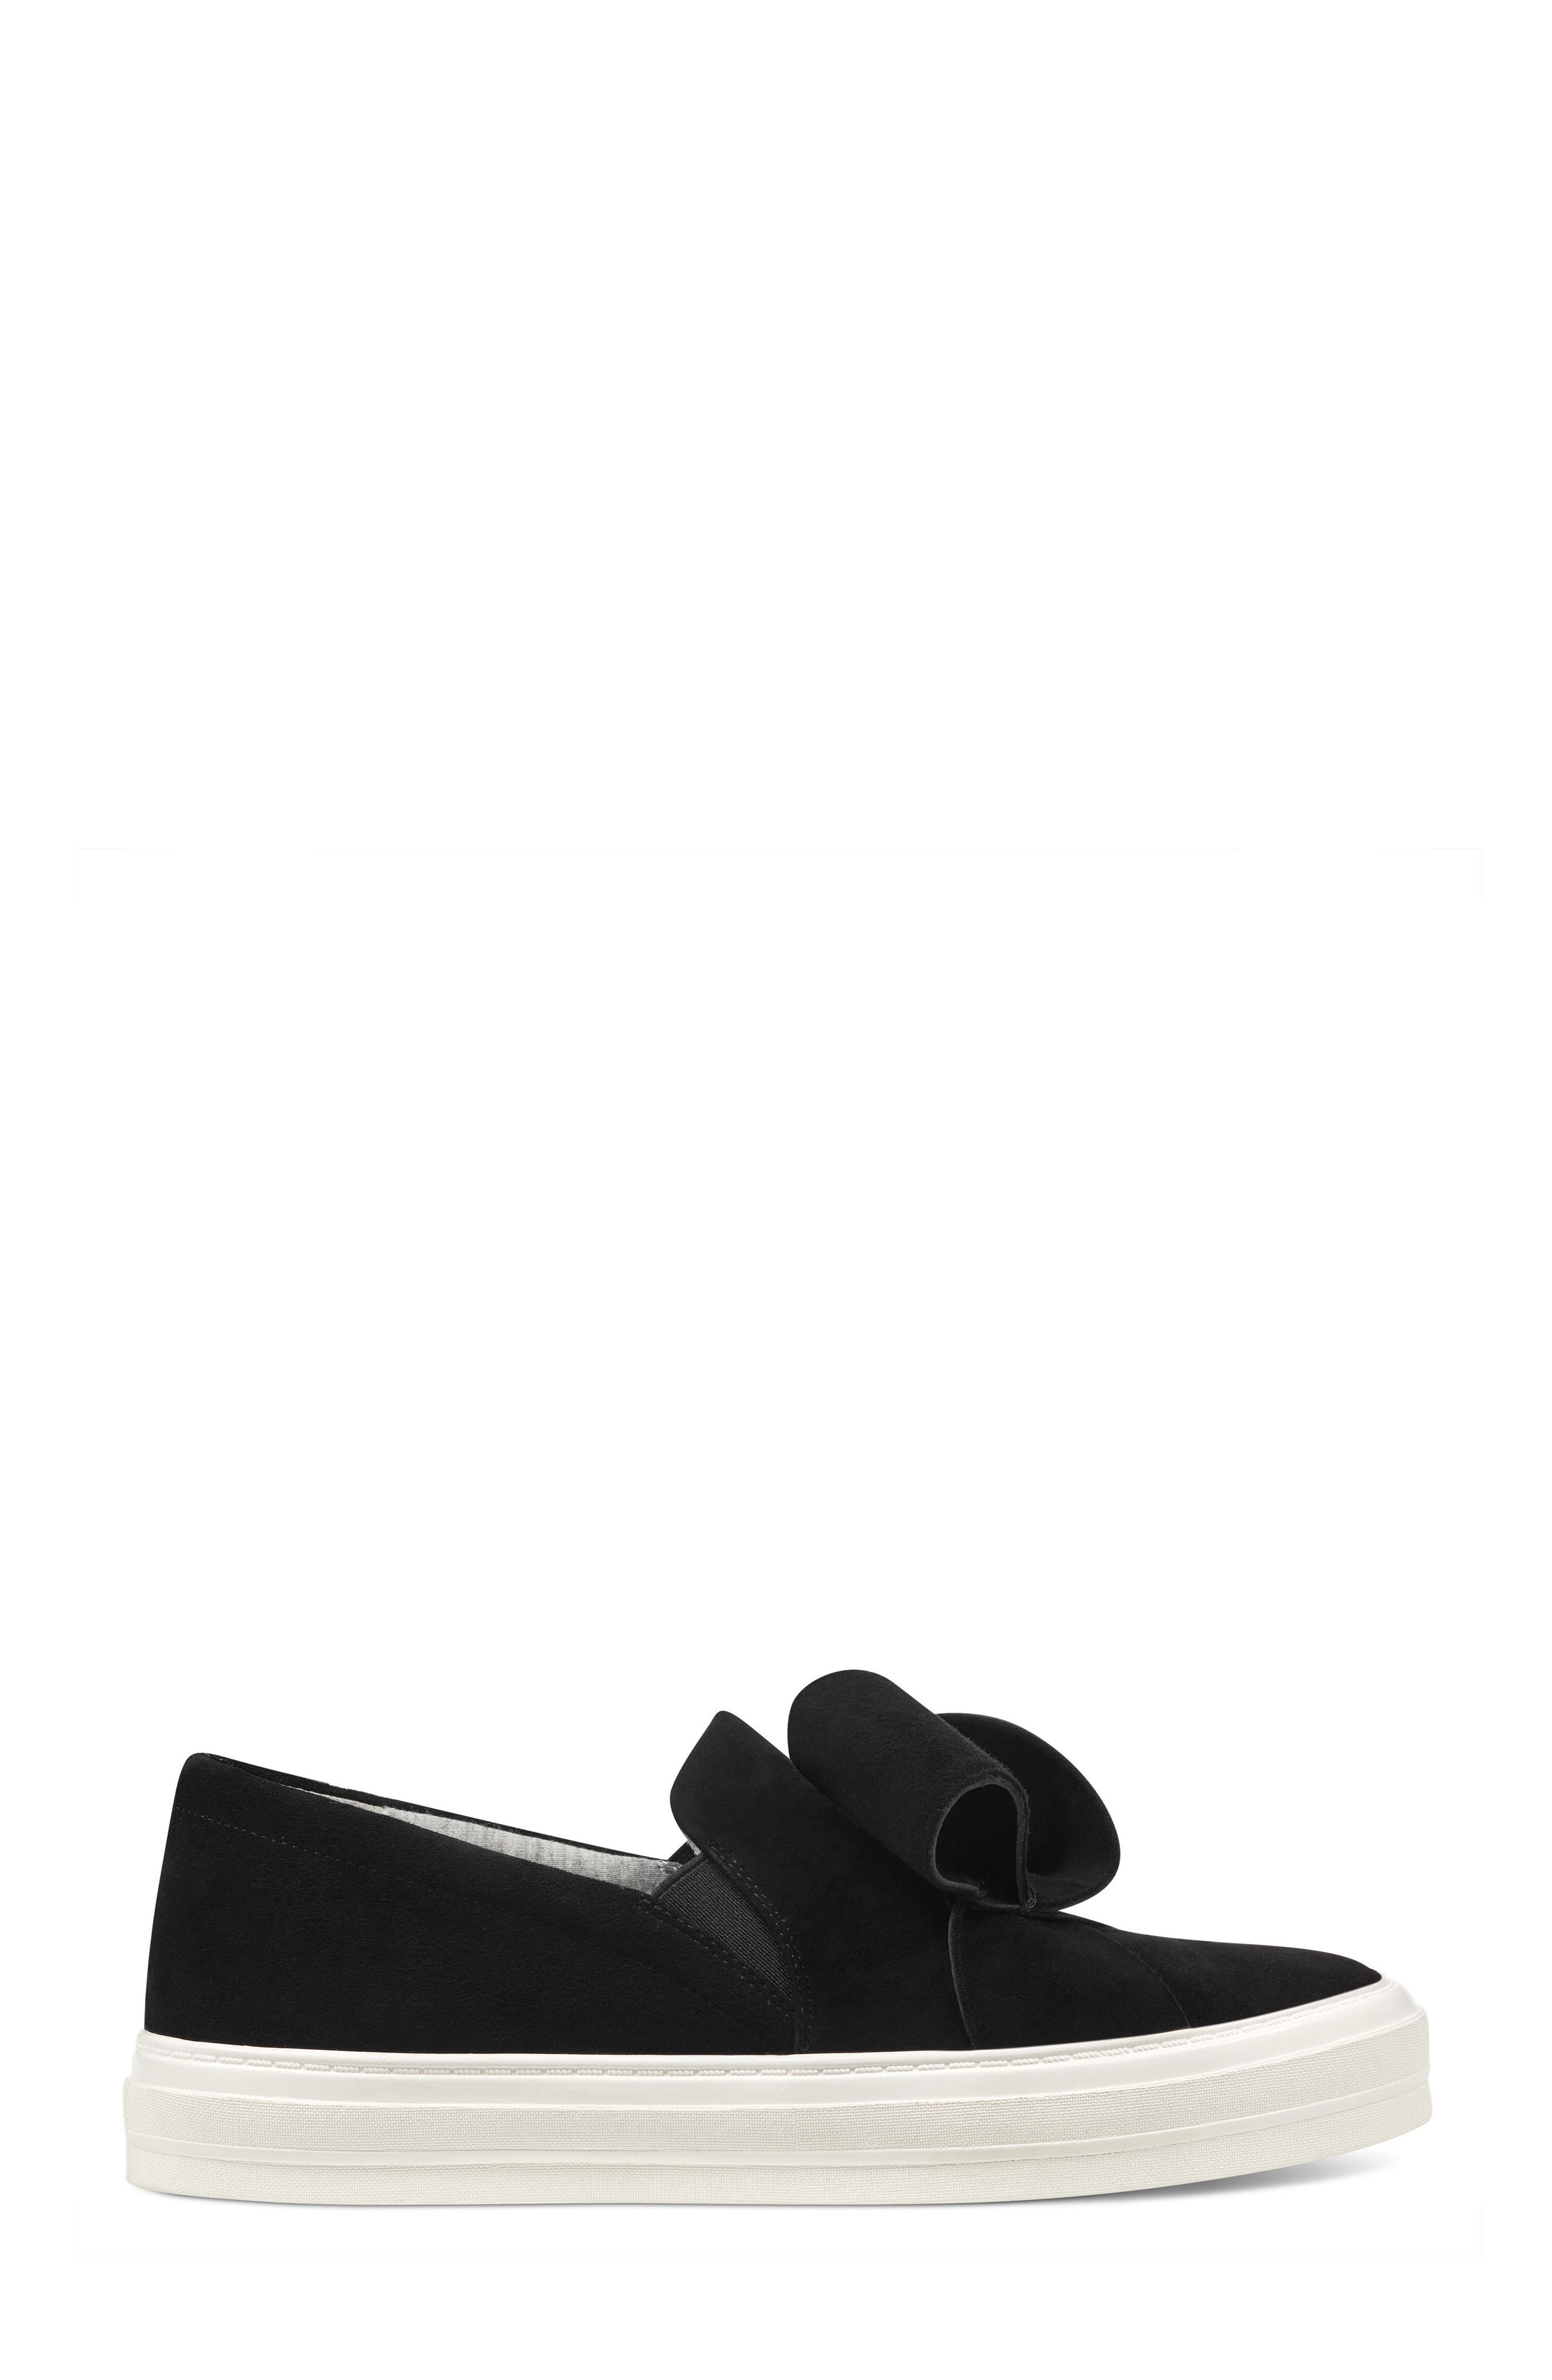 Odienella Slip-On Sneaker,                             Alternate thumbnail 3, color,                             BLACK MULTI SUEDE